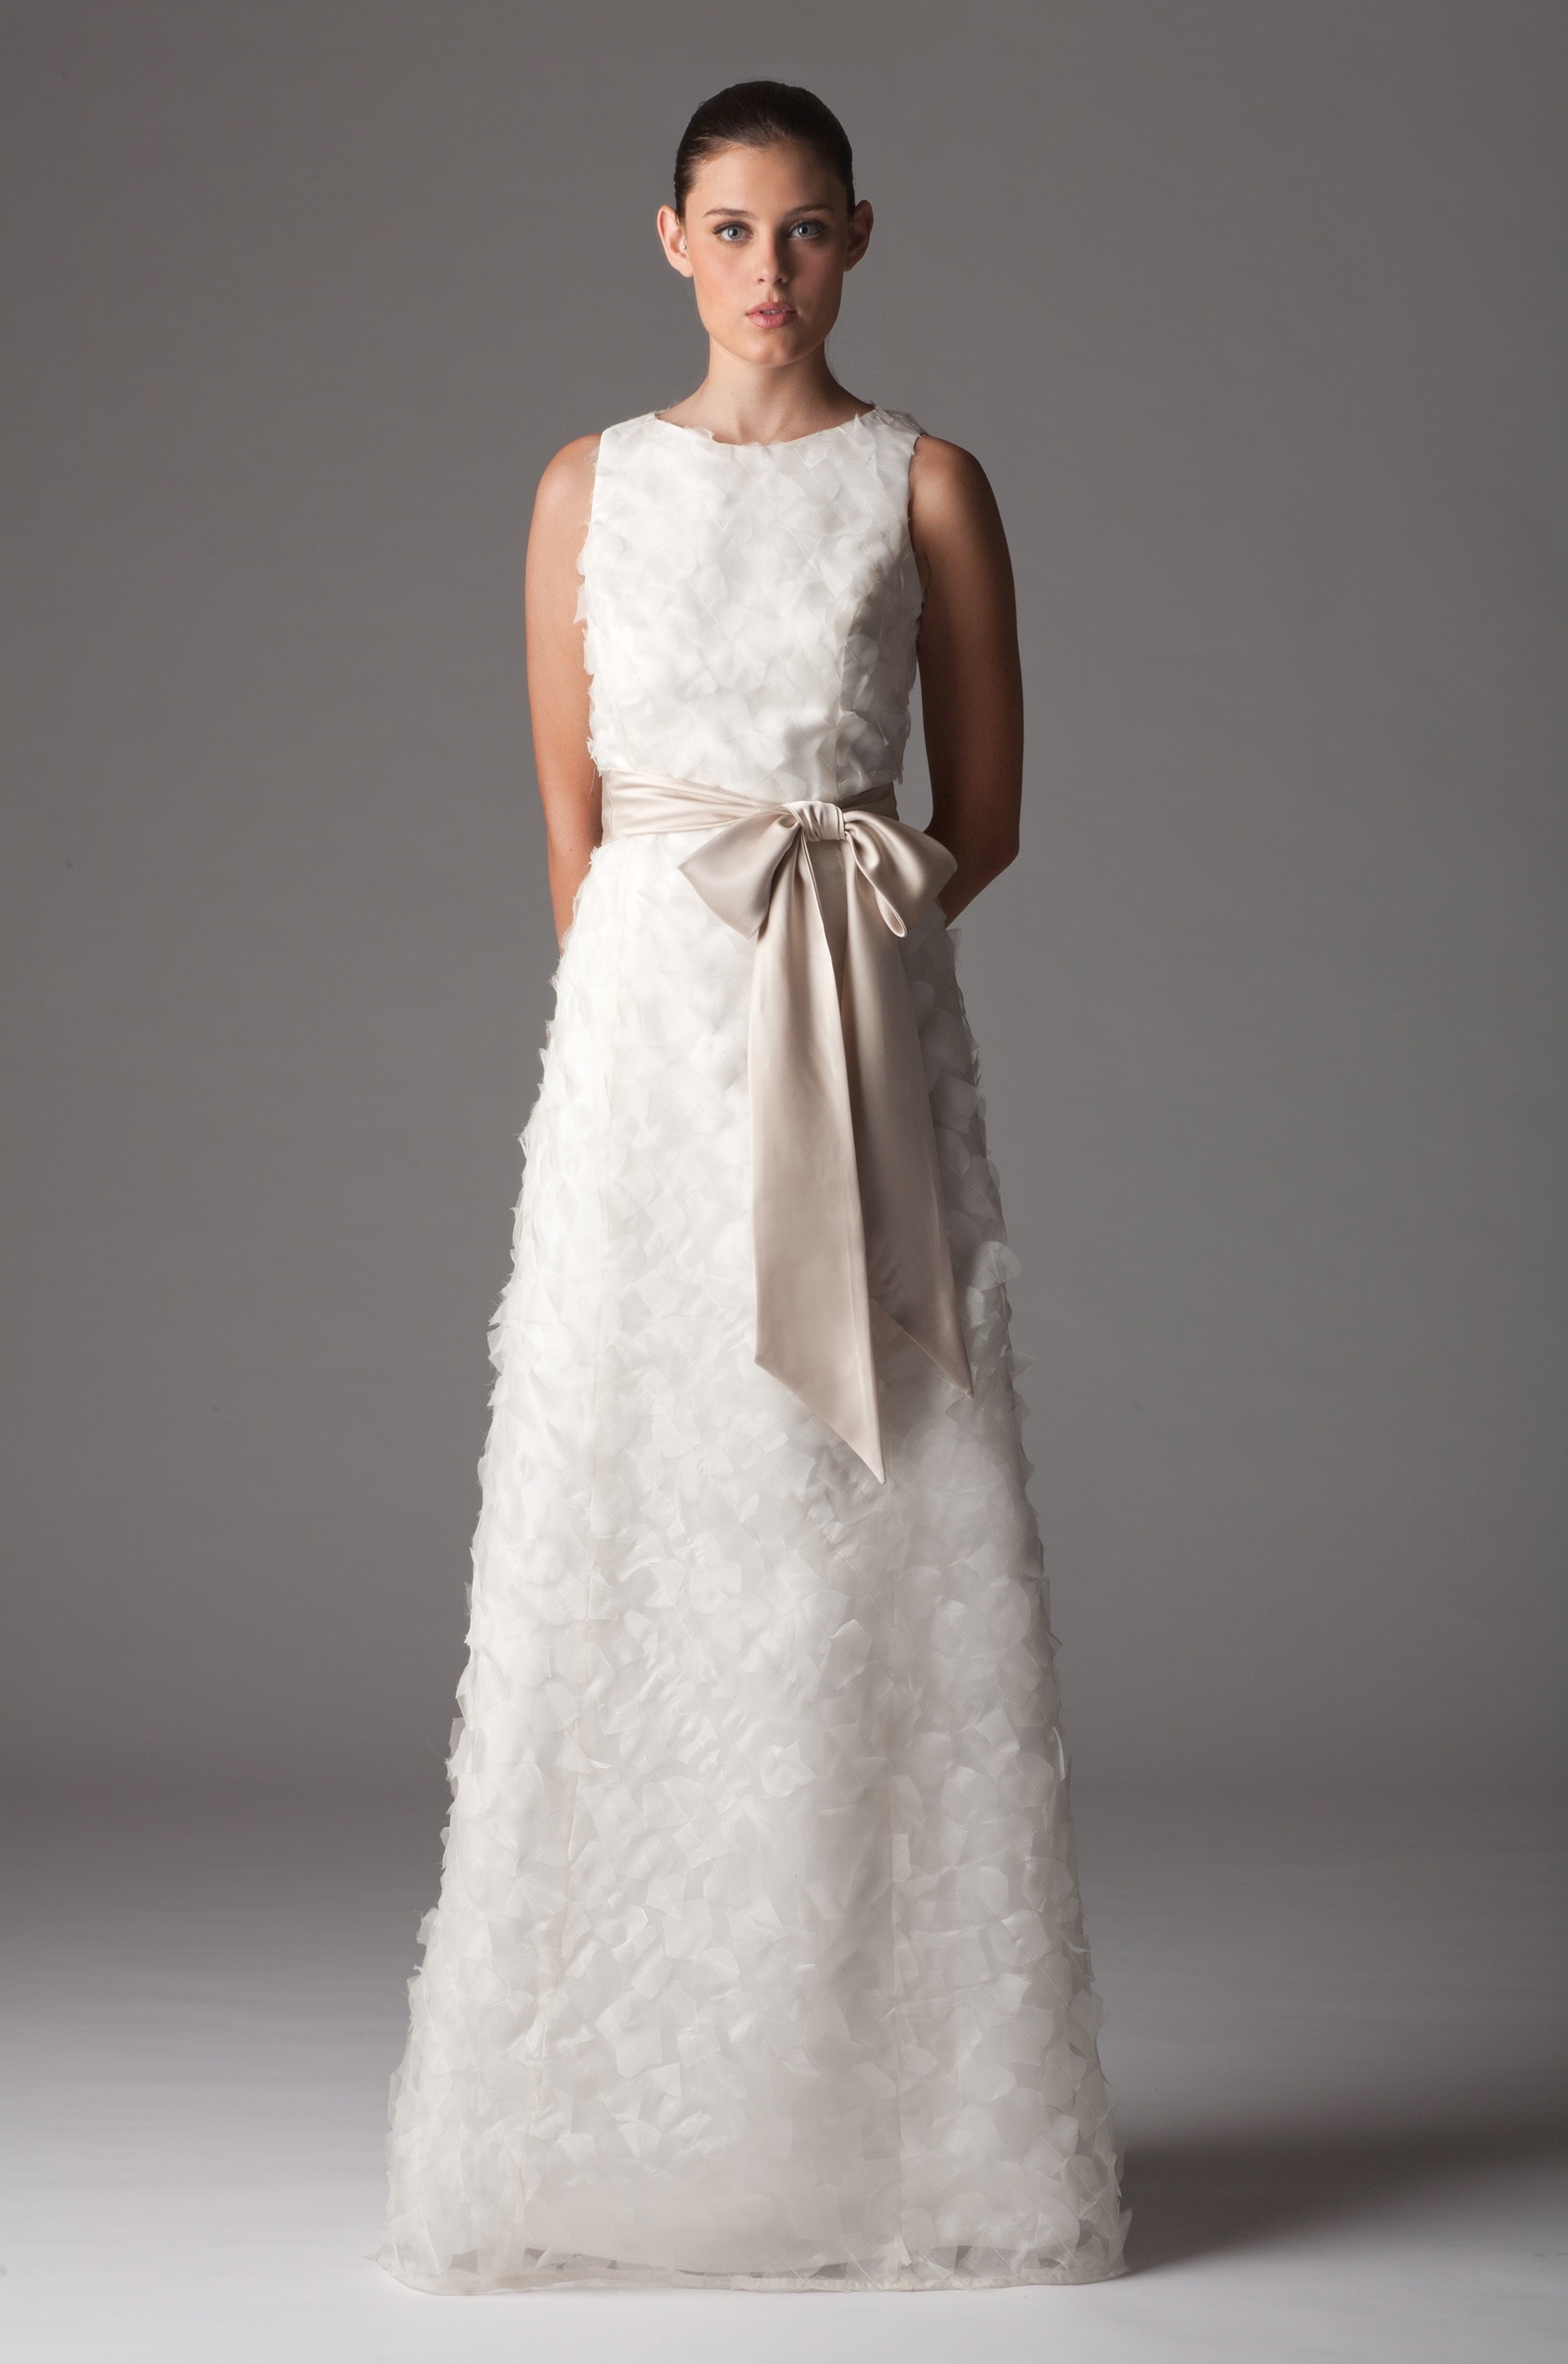 Wedding Dresses With High Neck : Modest high neck wedding dress onewed